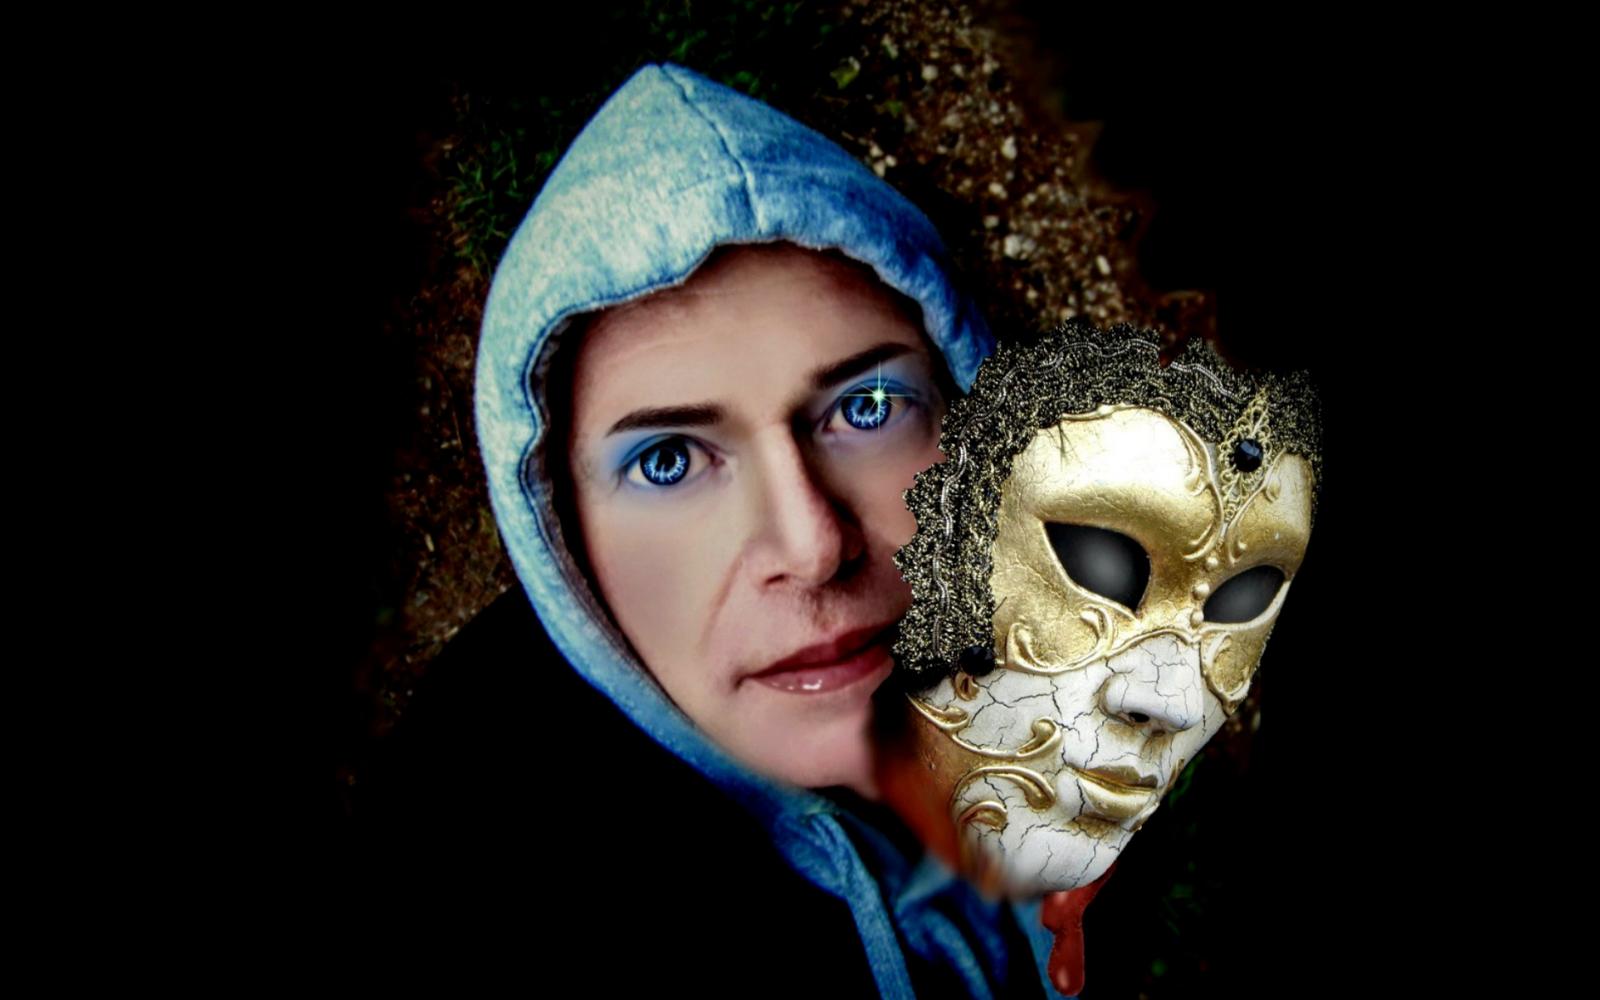 behind my mask by Mittelfranke